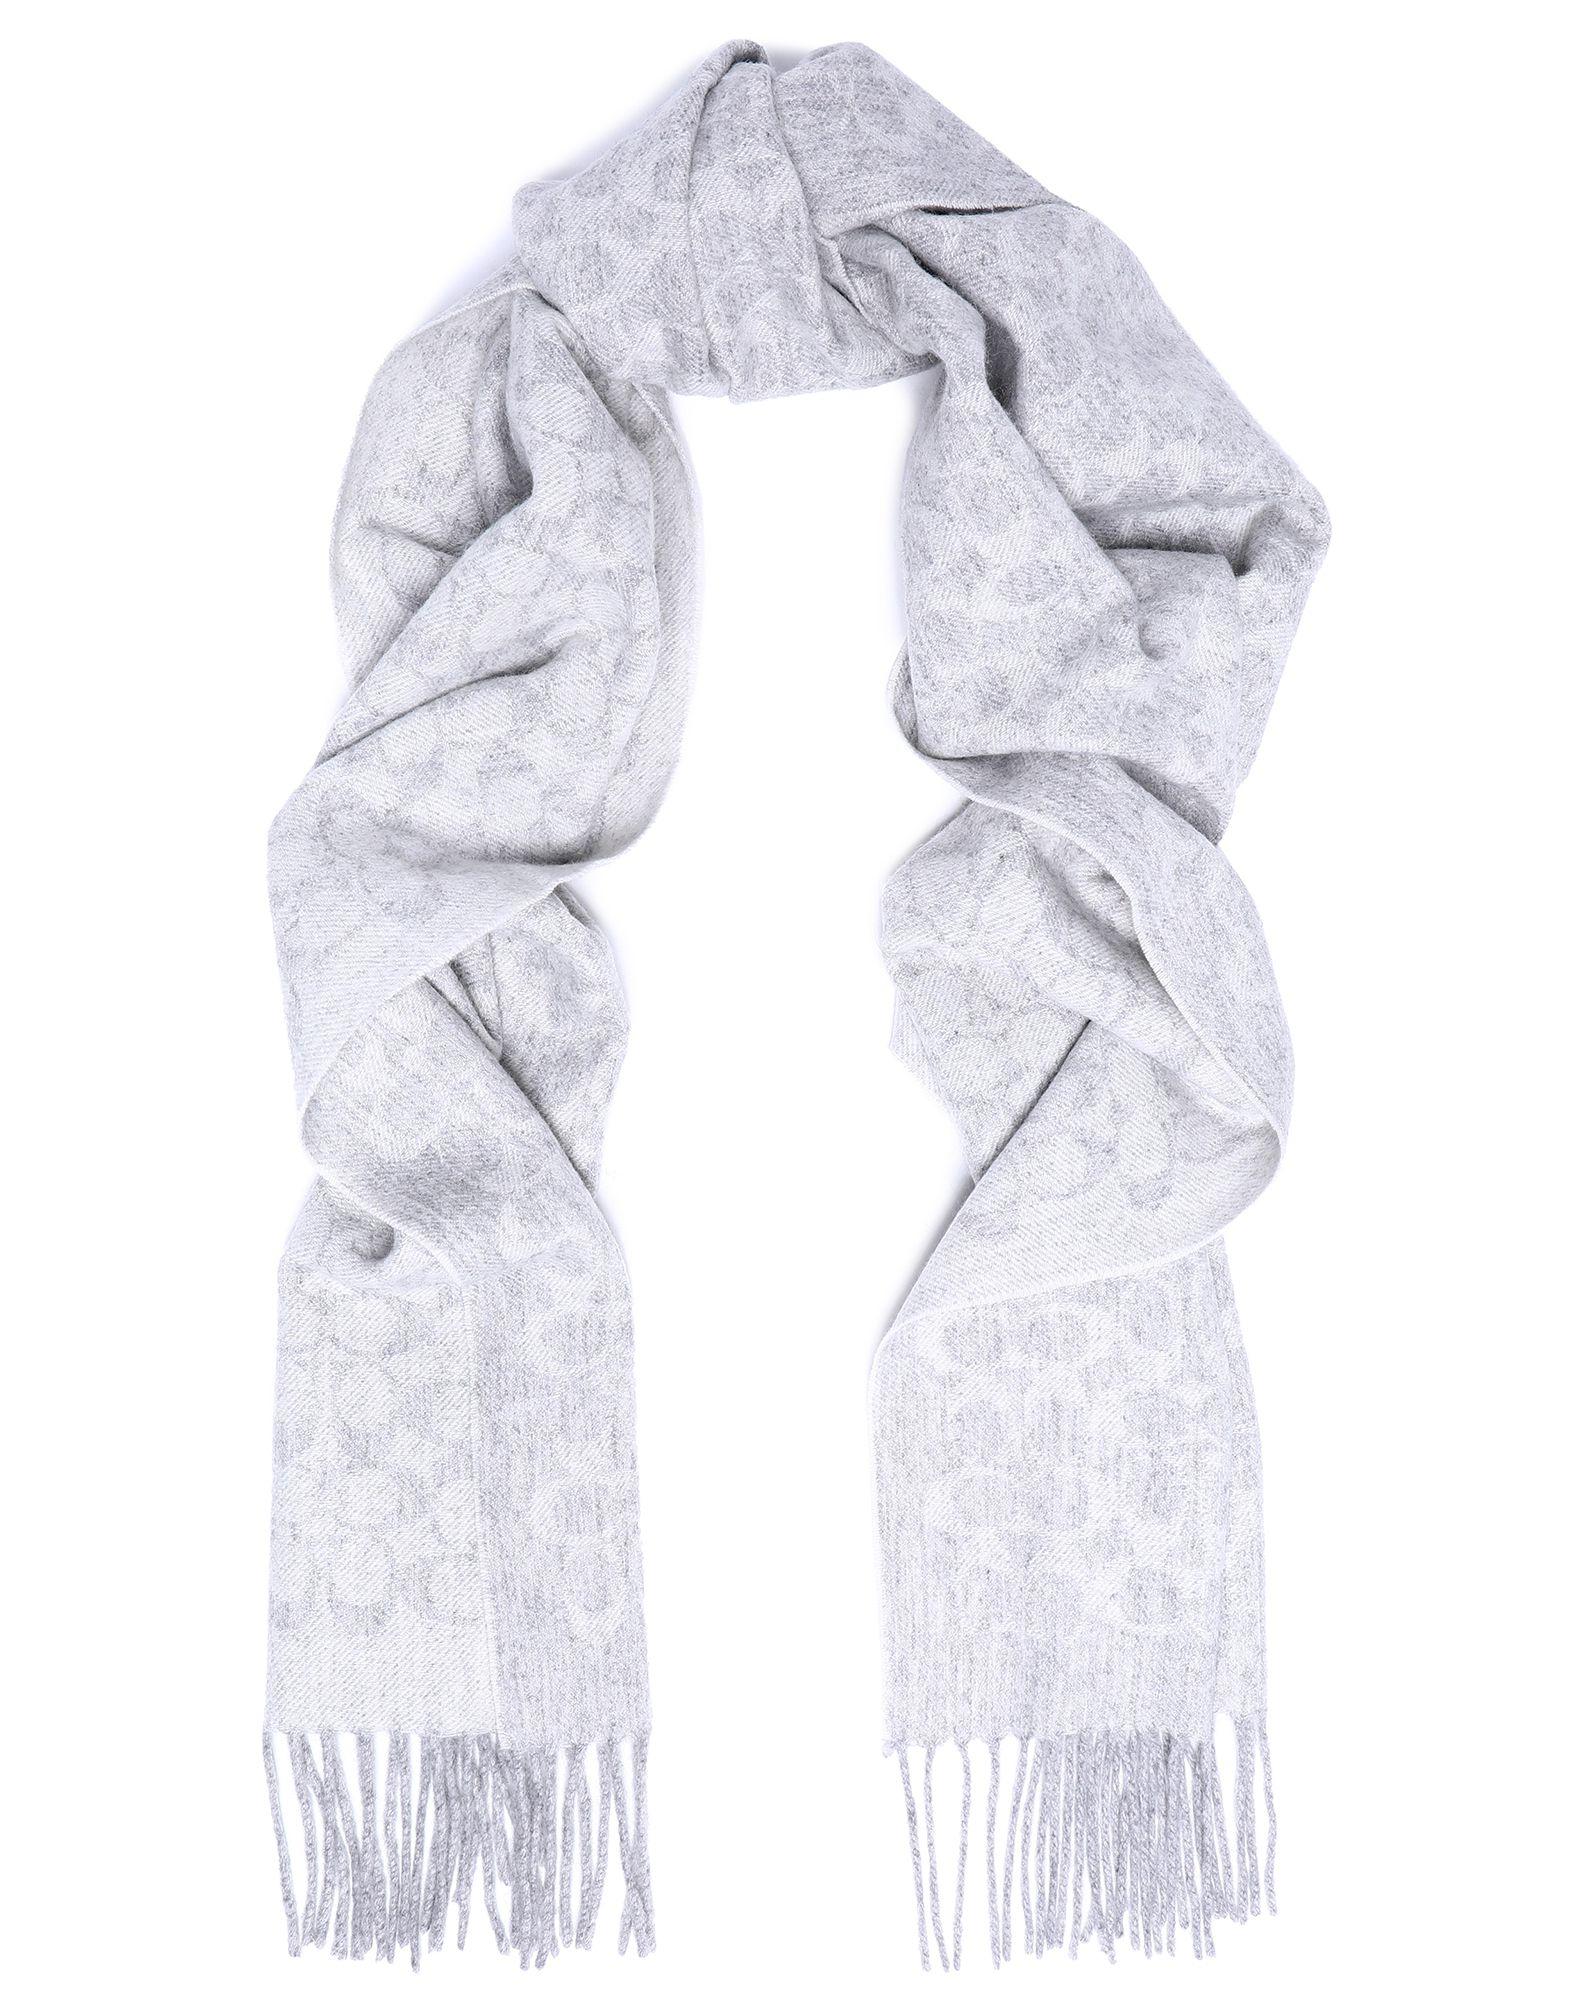 COACH Scarves. flannel, fringed, logo design. 95% Wool, 5% Cashmere